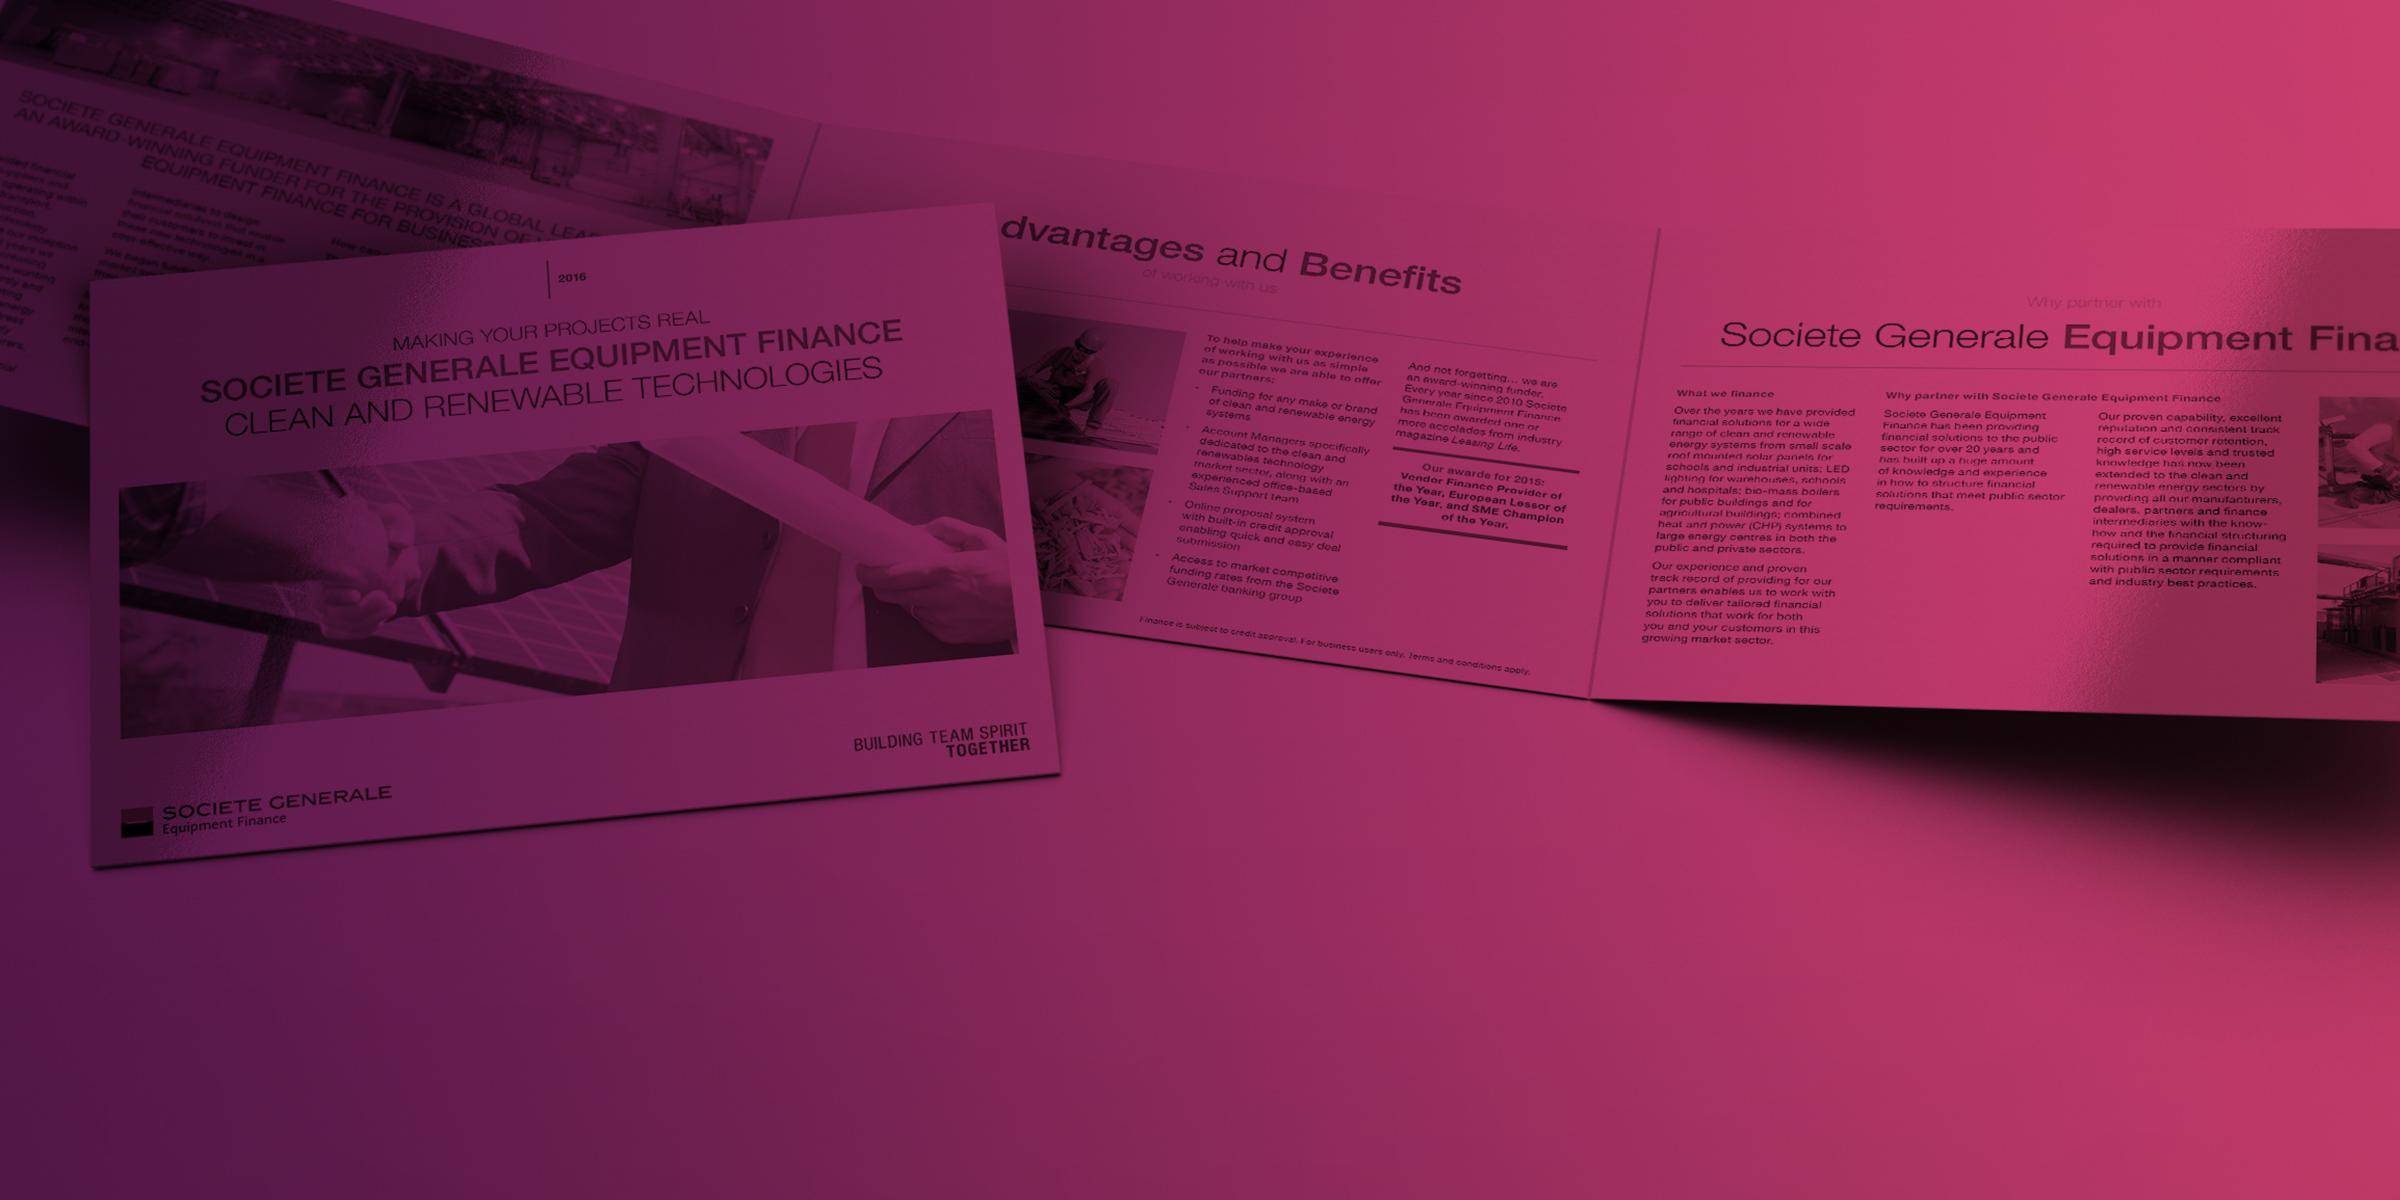 Societe Generale Equipment Finance: Brochure